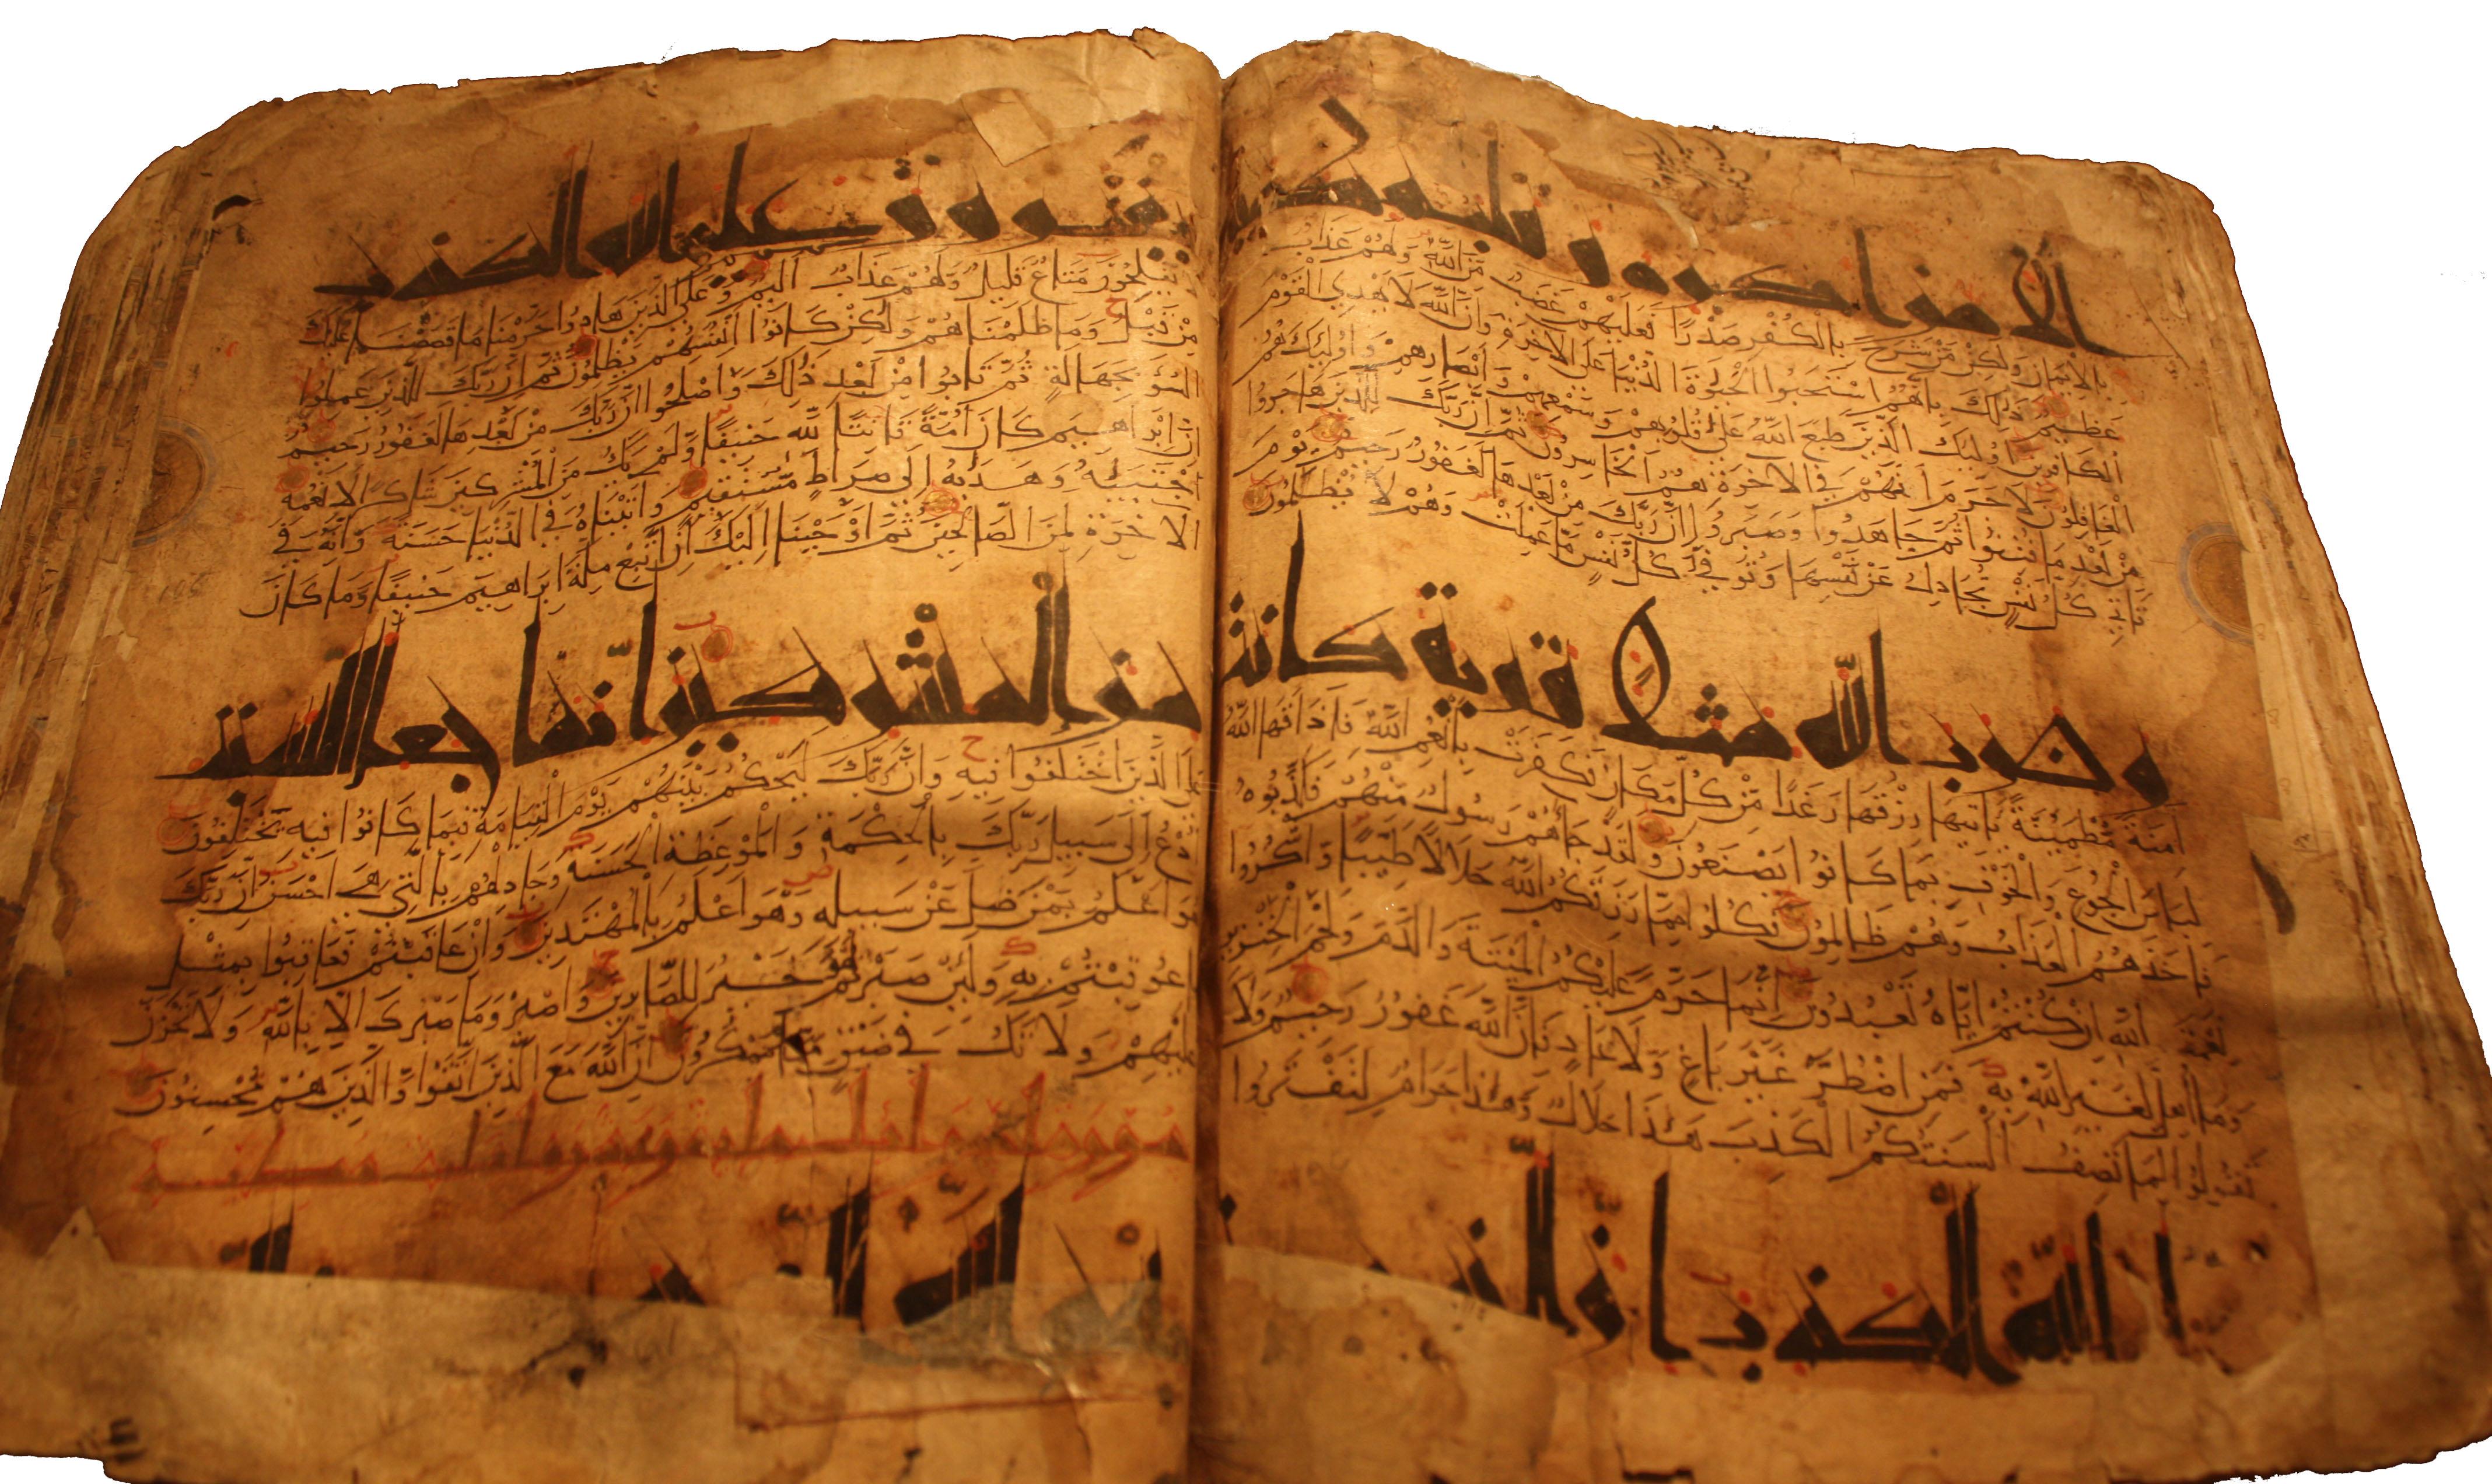 Surat+Al+Fatiha Learn Surah Al-Fatiha in English [HD] - YouTube